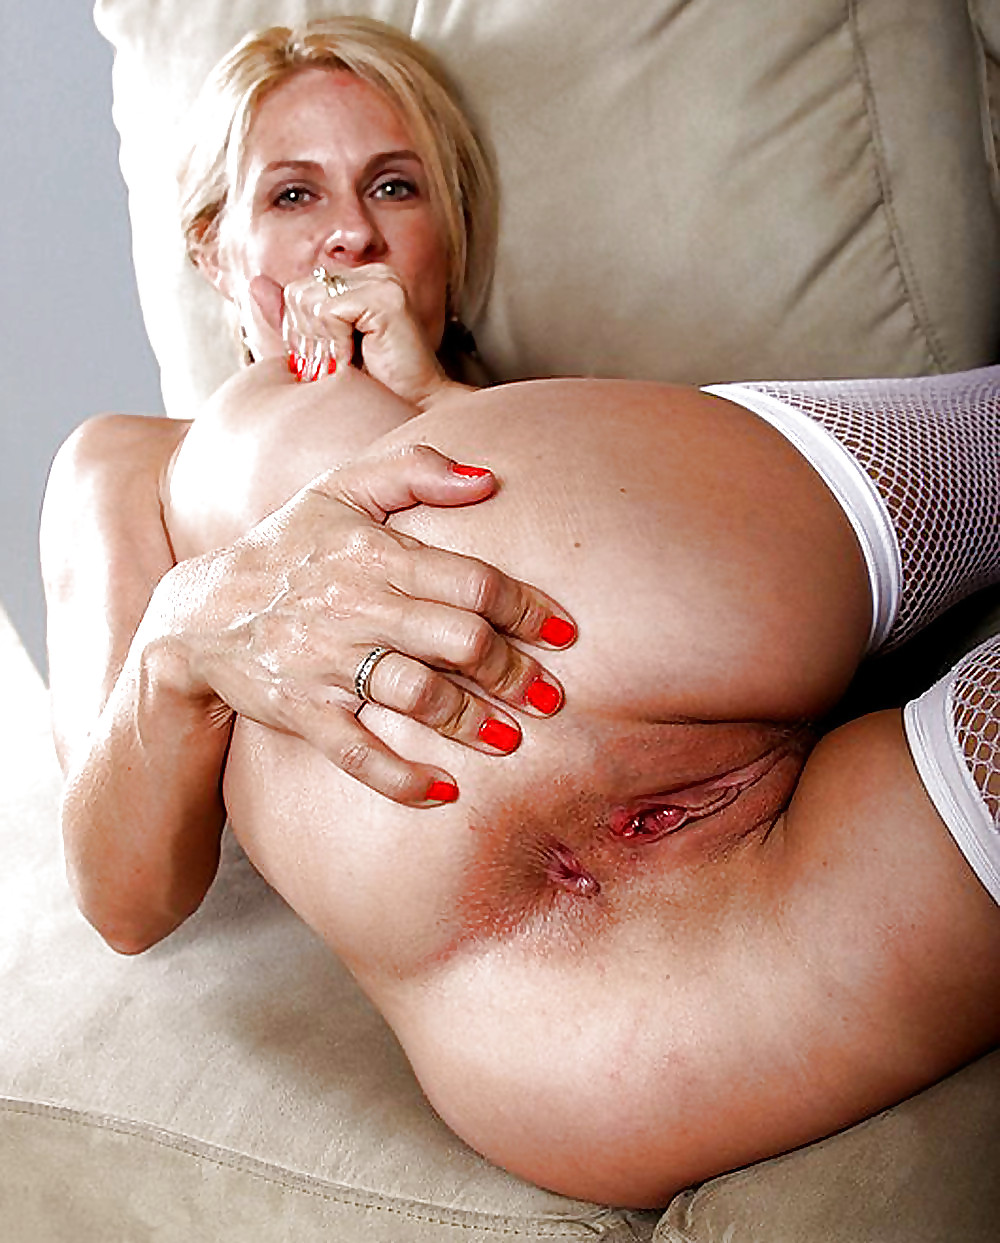 Annabel miller mature pussy